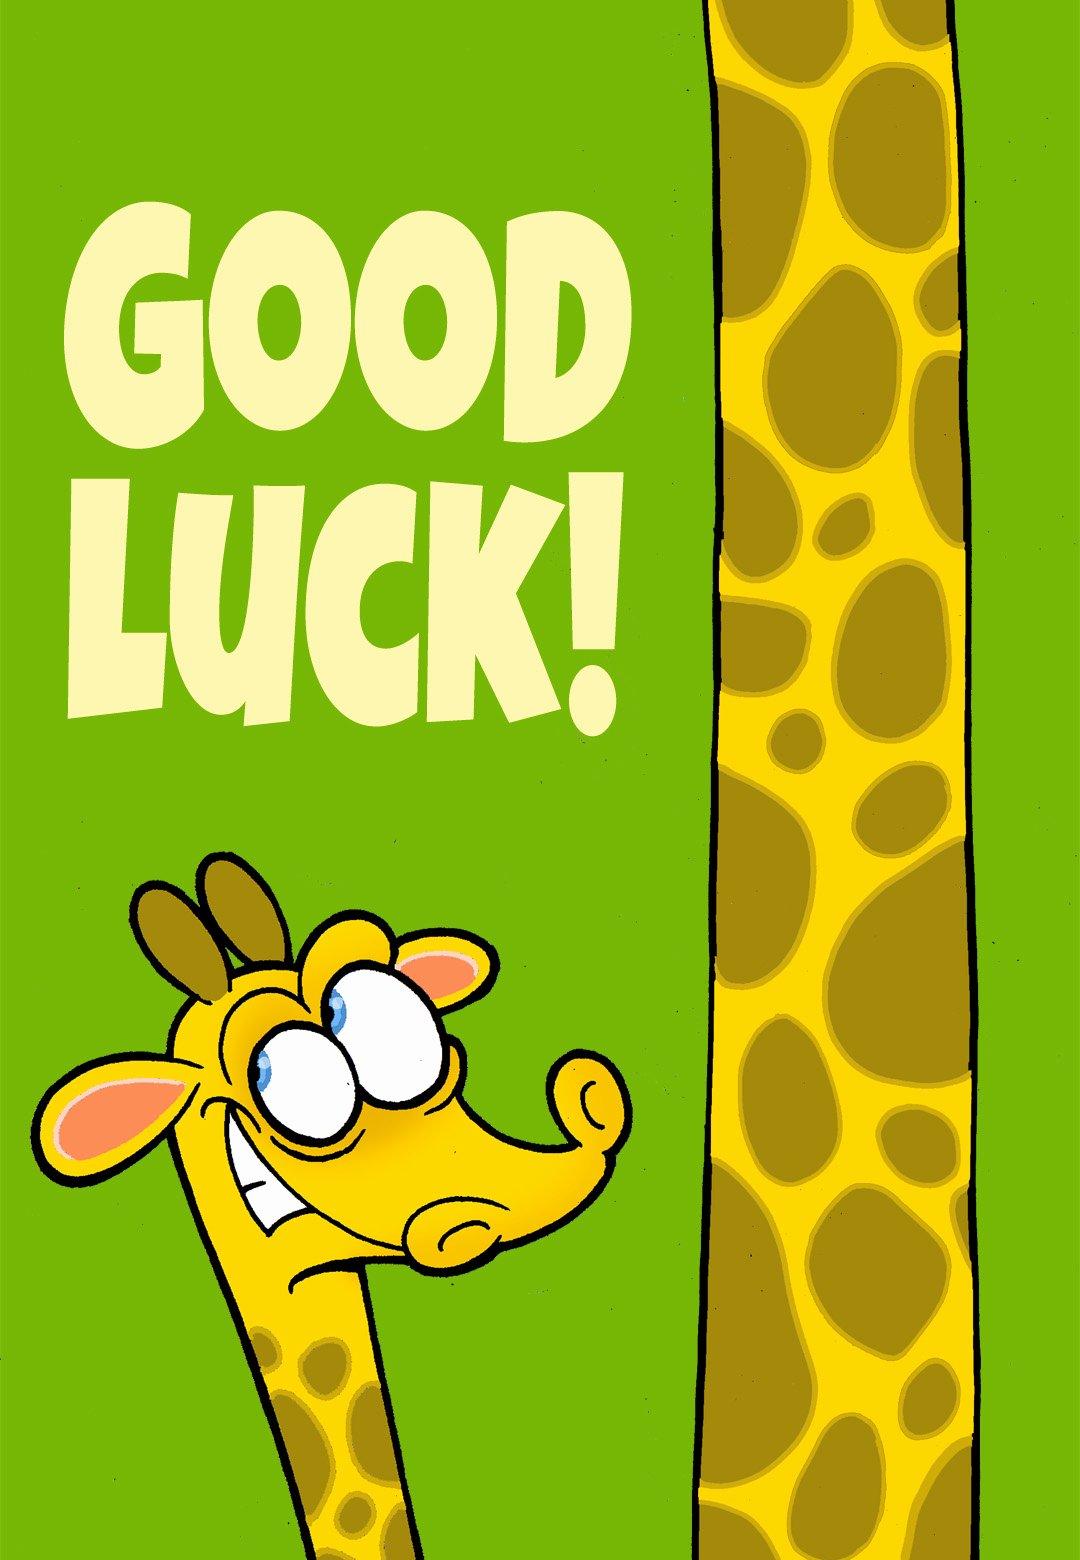 Free Good Luck Cards Inspirational Good Luck Good Luck Card Free